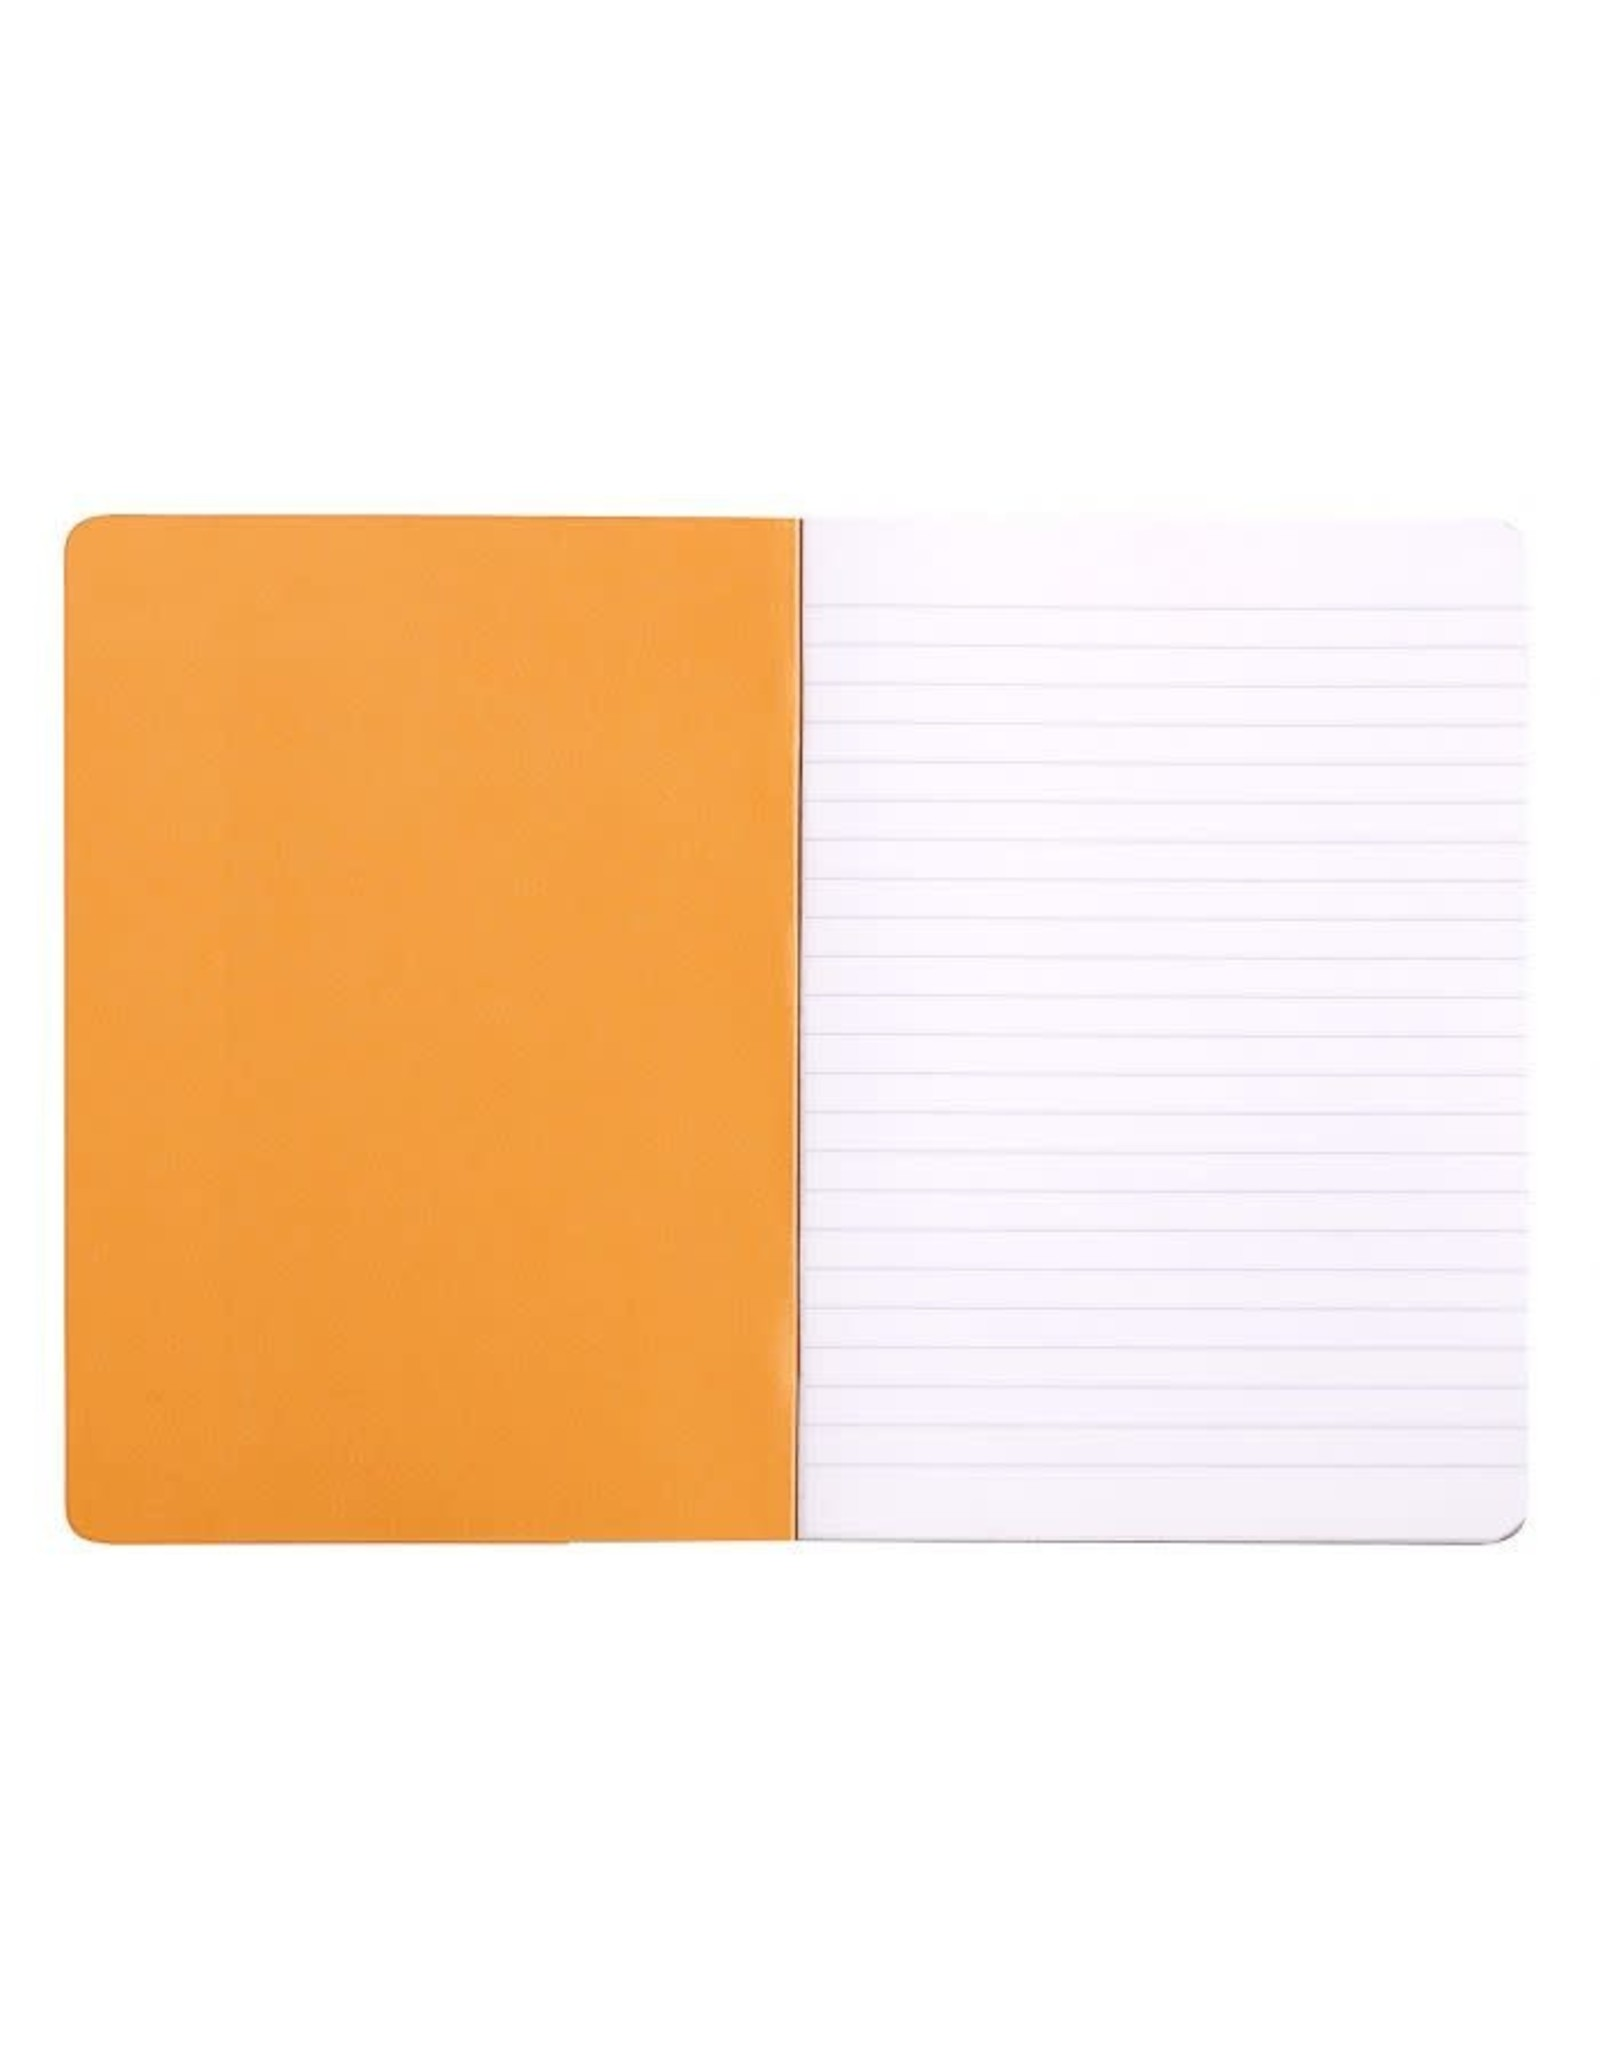 Rhodia Rhodia Orange Lined Classic Notebook 6 x 8.25